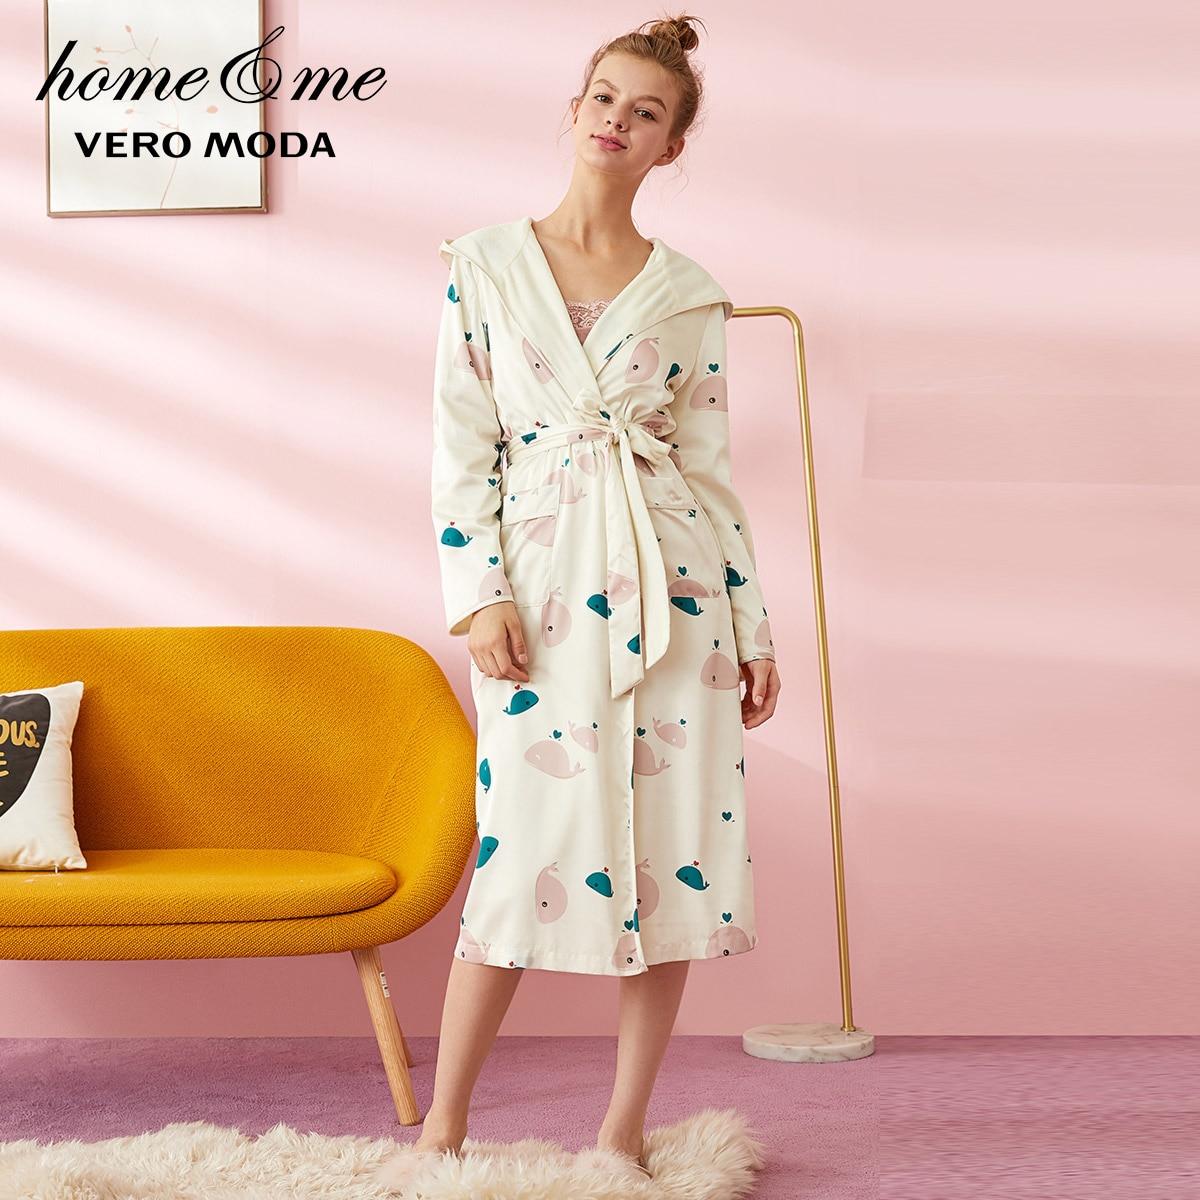 Vero Moda Women's Cartoon Pattern Cinched Waist Nightgown Bathrobe   319421506